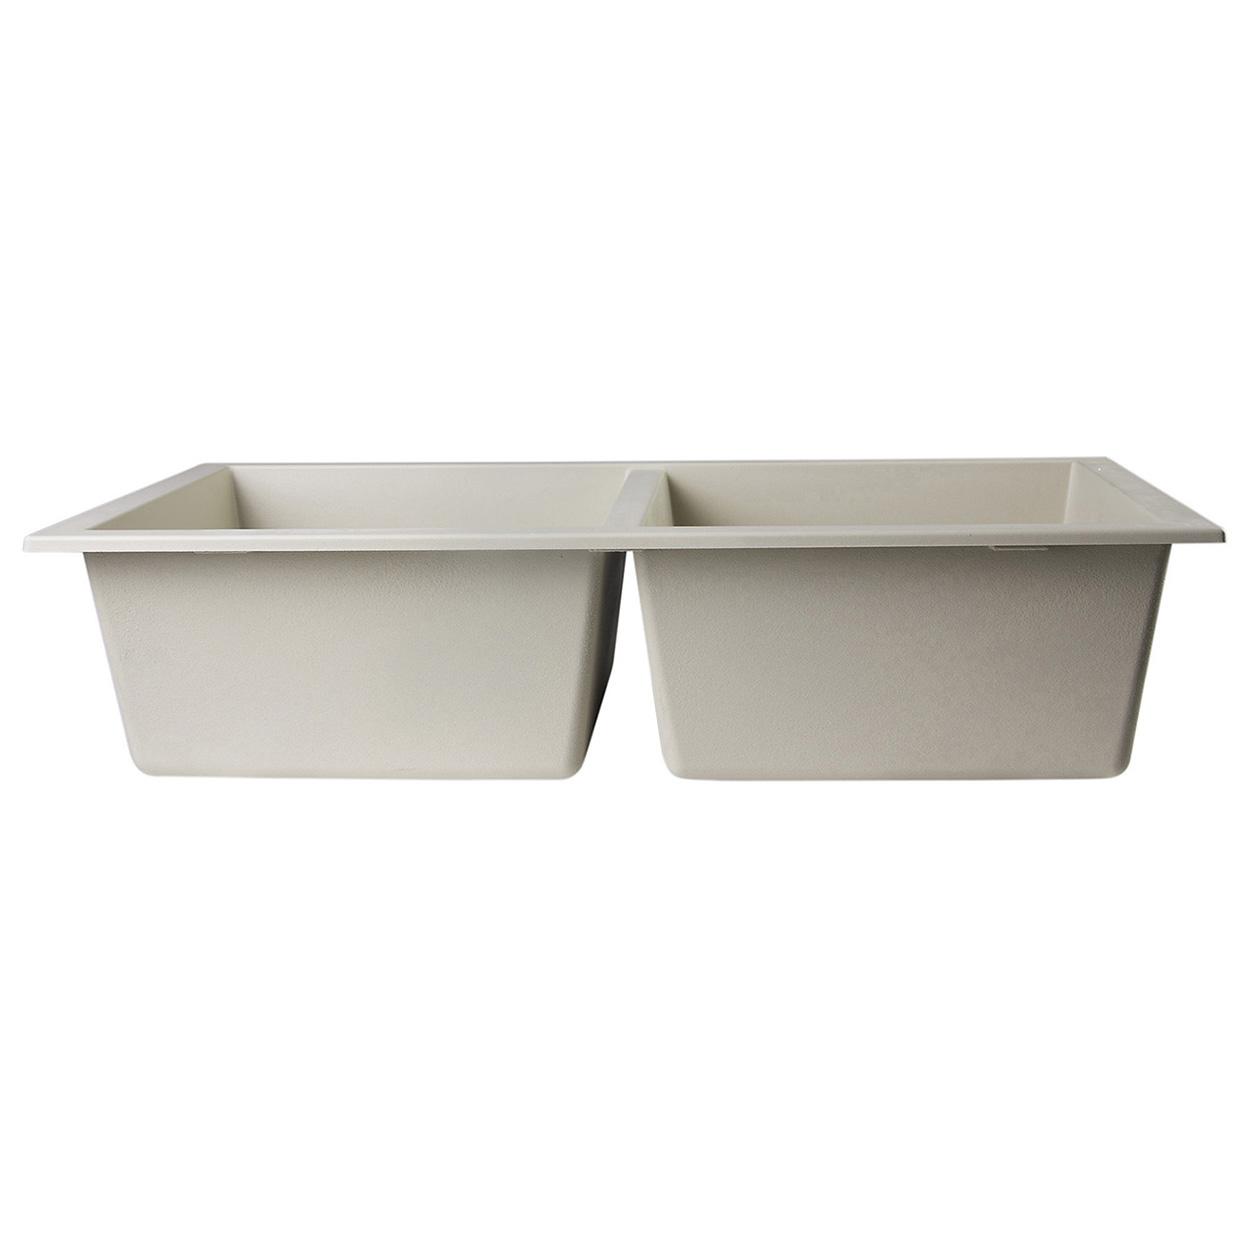 Brands Of Kitchen Sinks Top Stainless Steel Sink